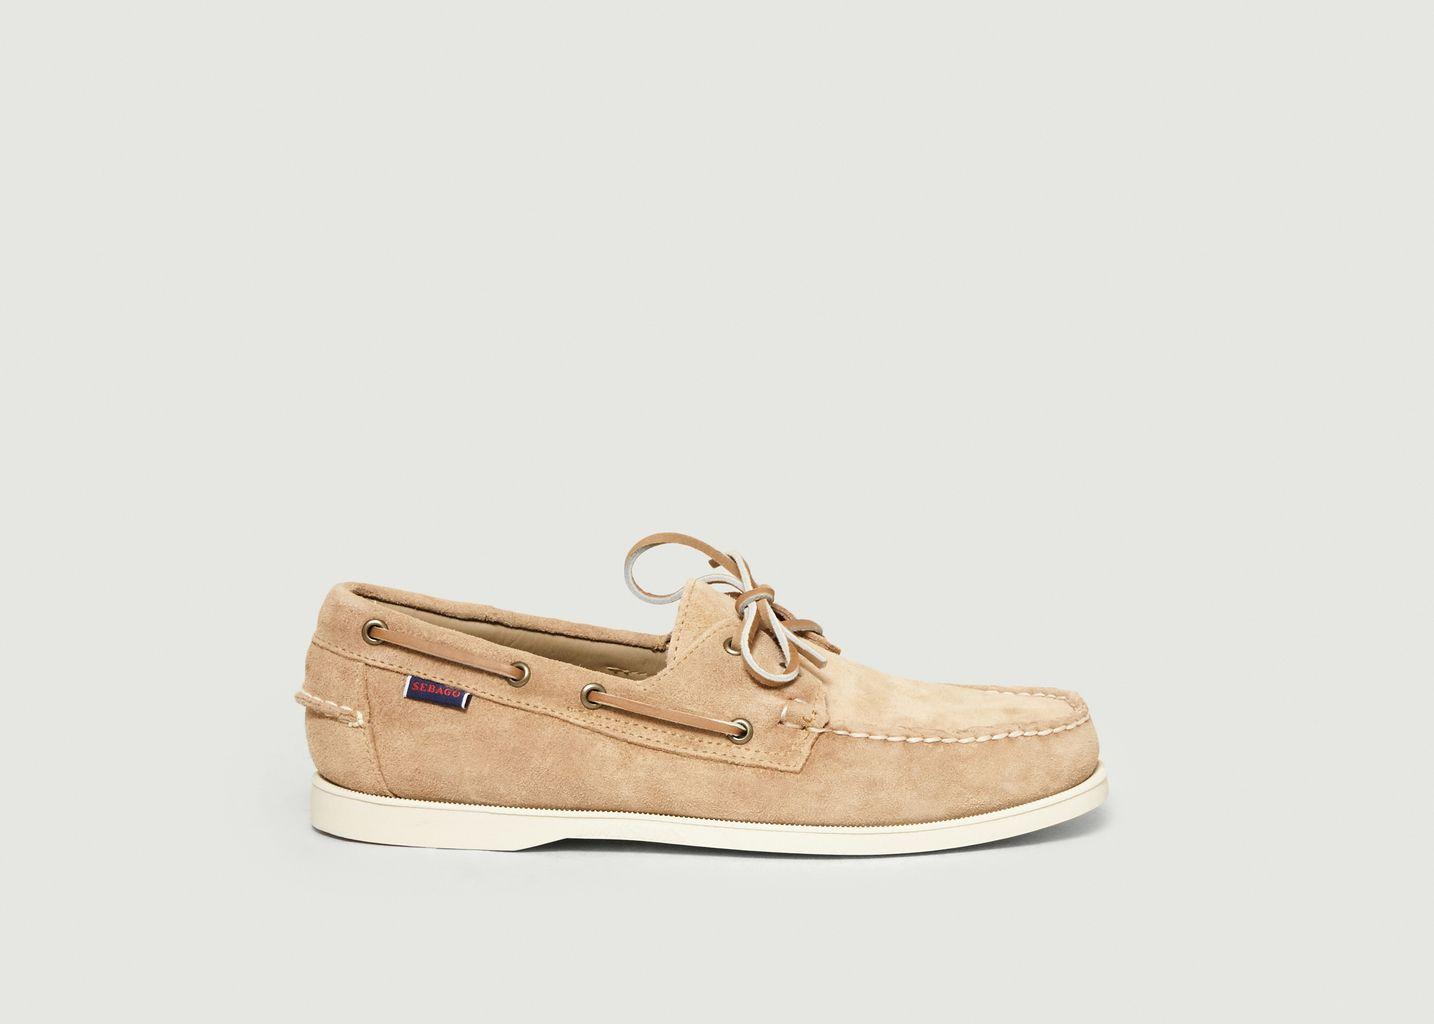 Chaussures bateau en daim Portland - Sebago